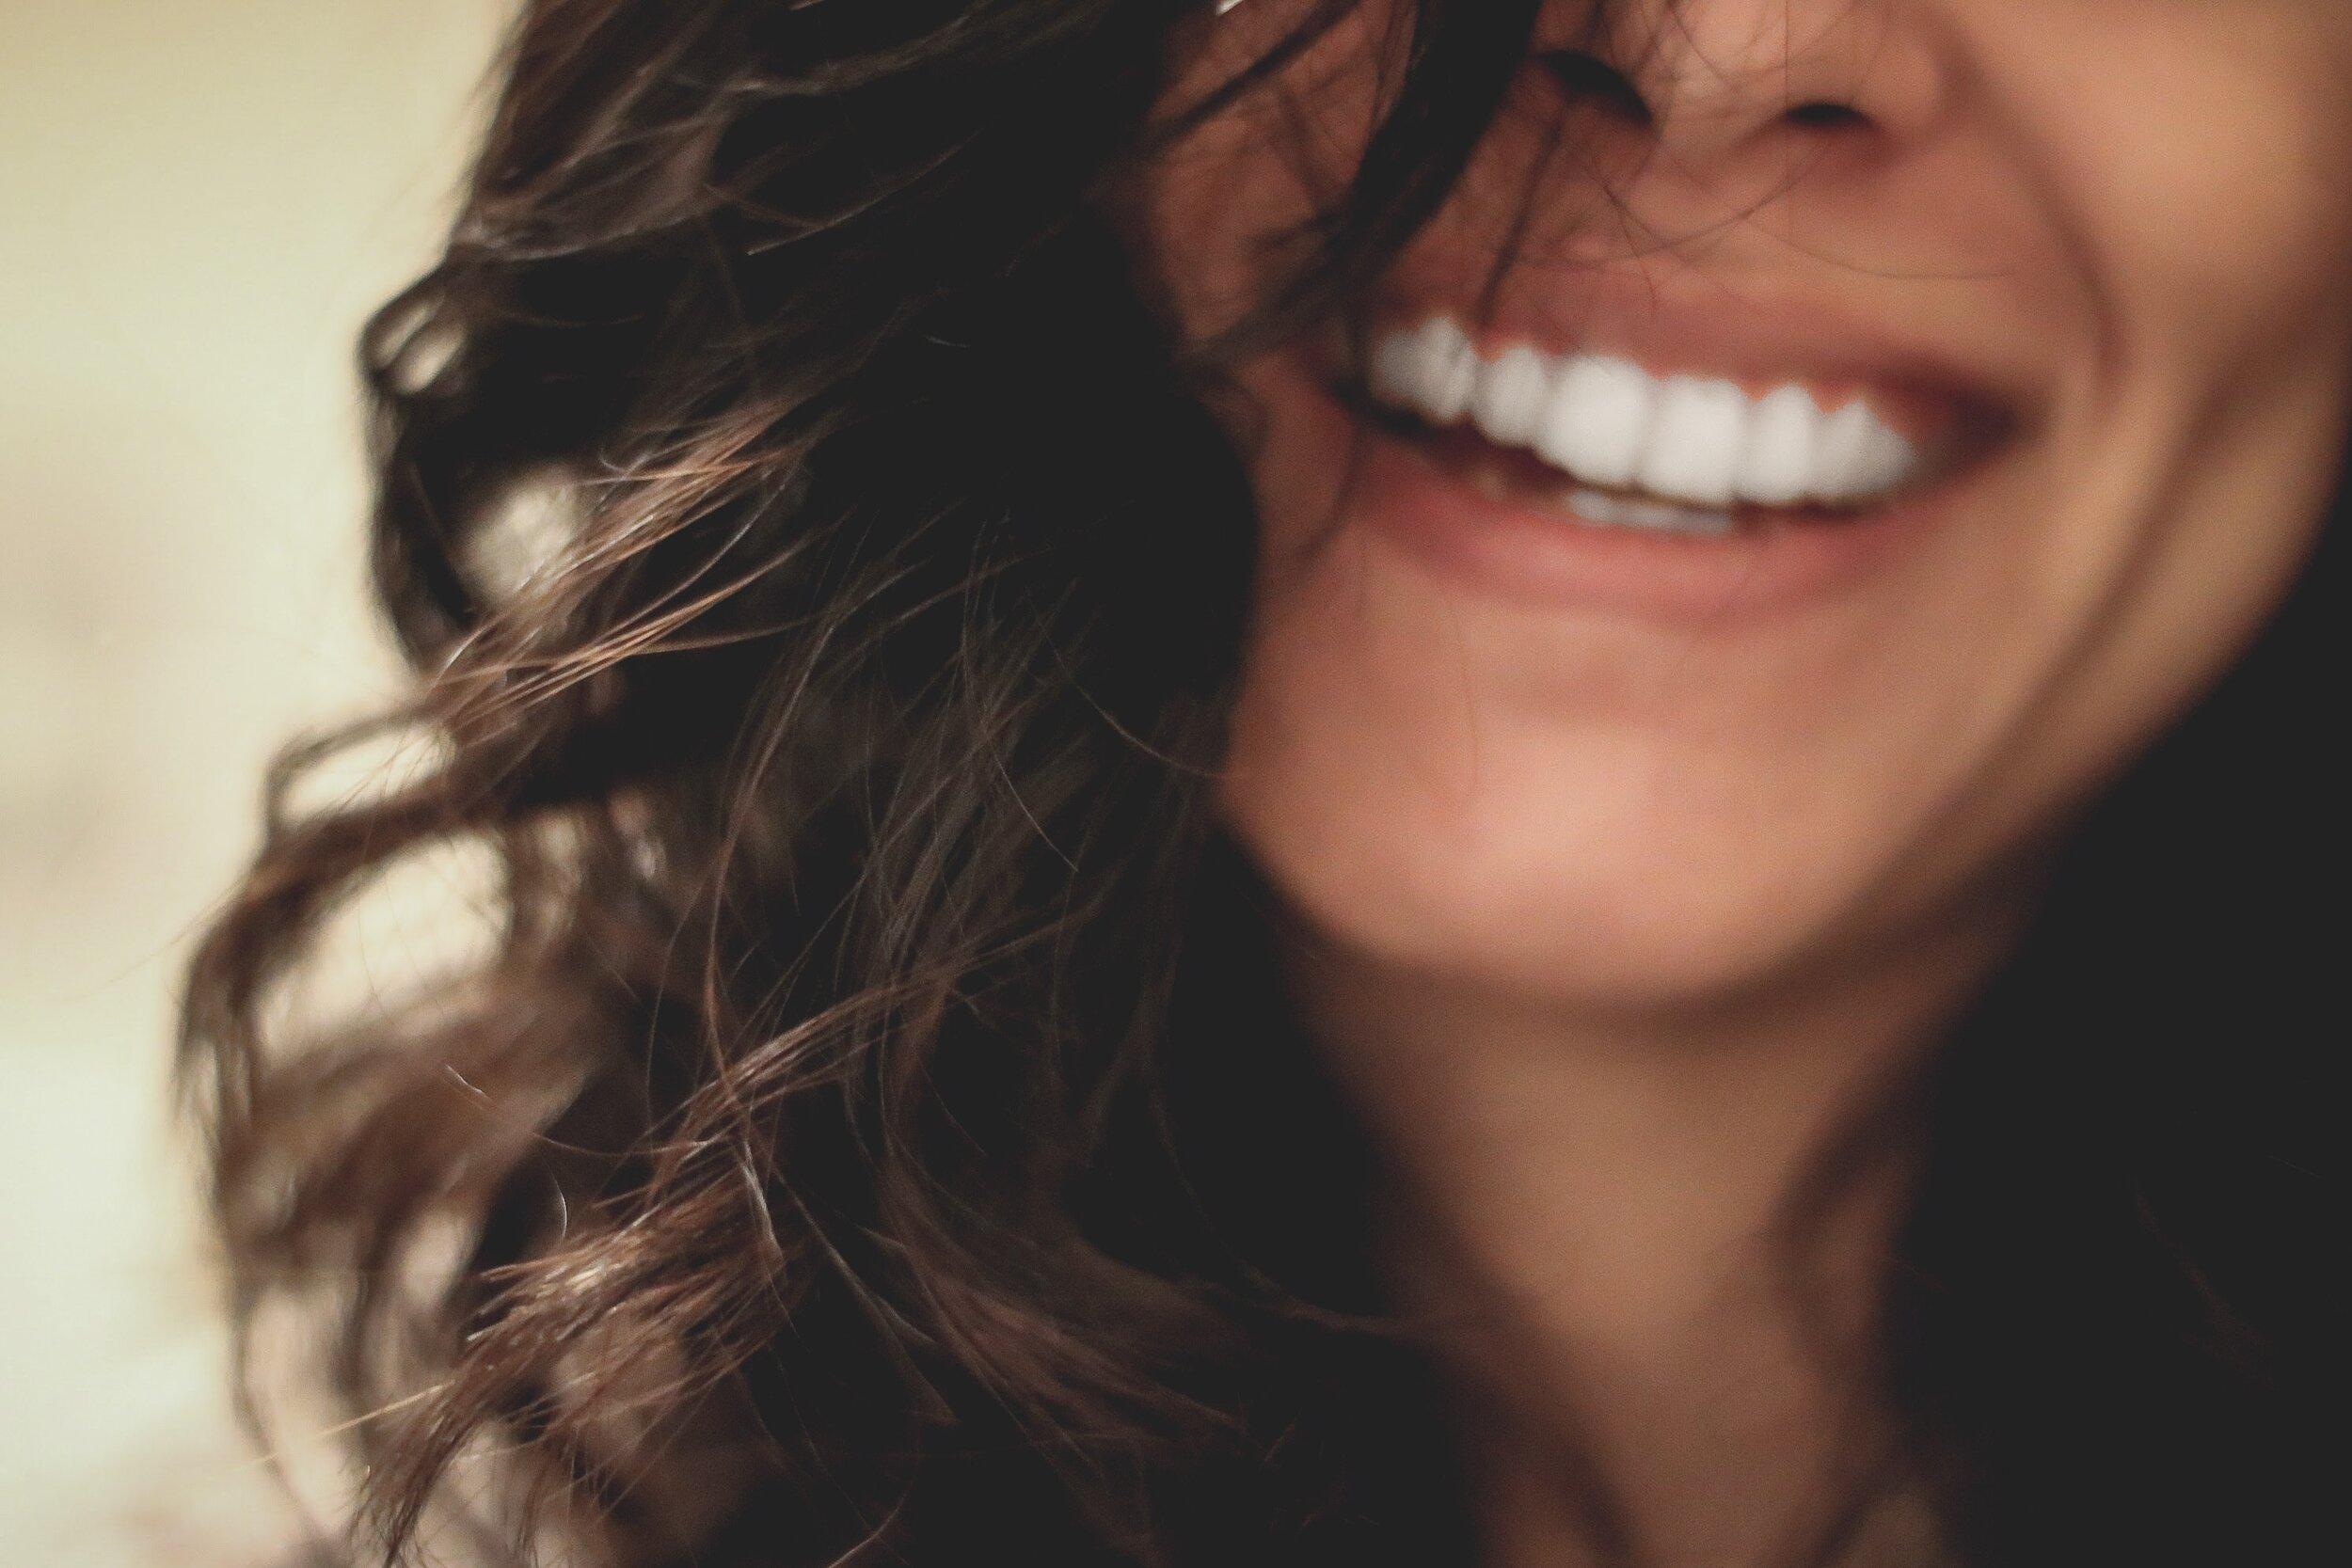 smile close up of girl.jpg